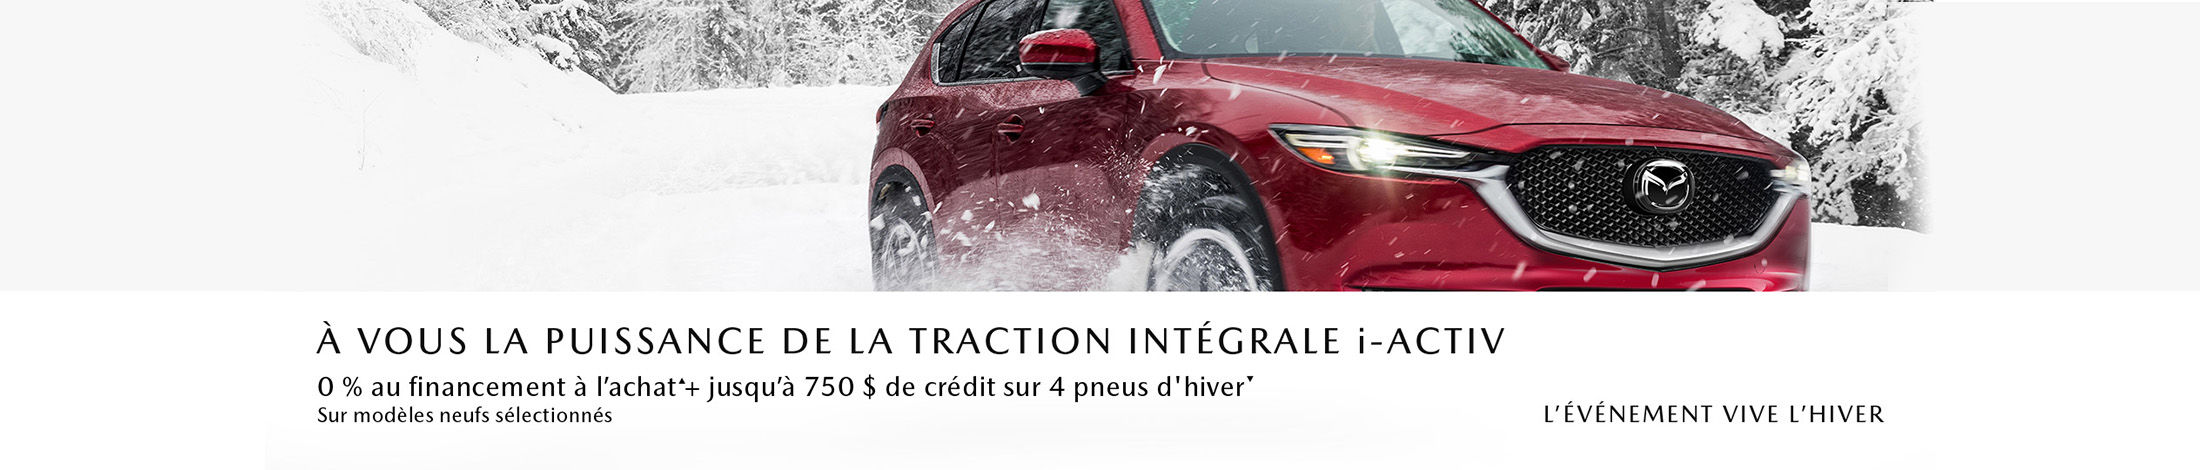 Événement vive l'hiver Mazda